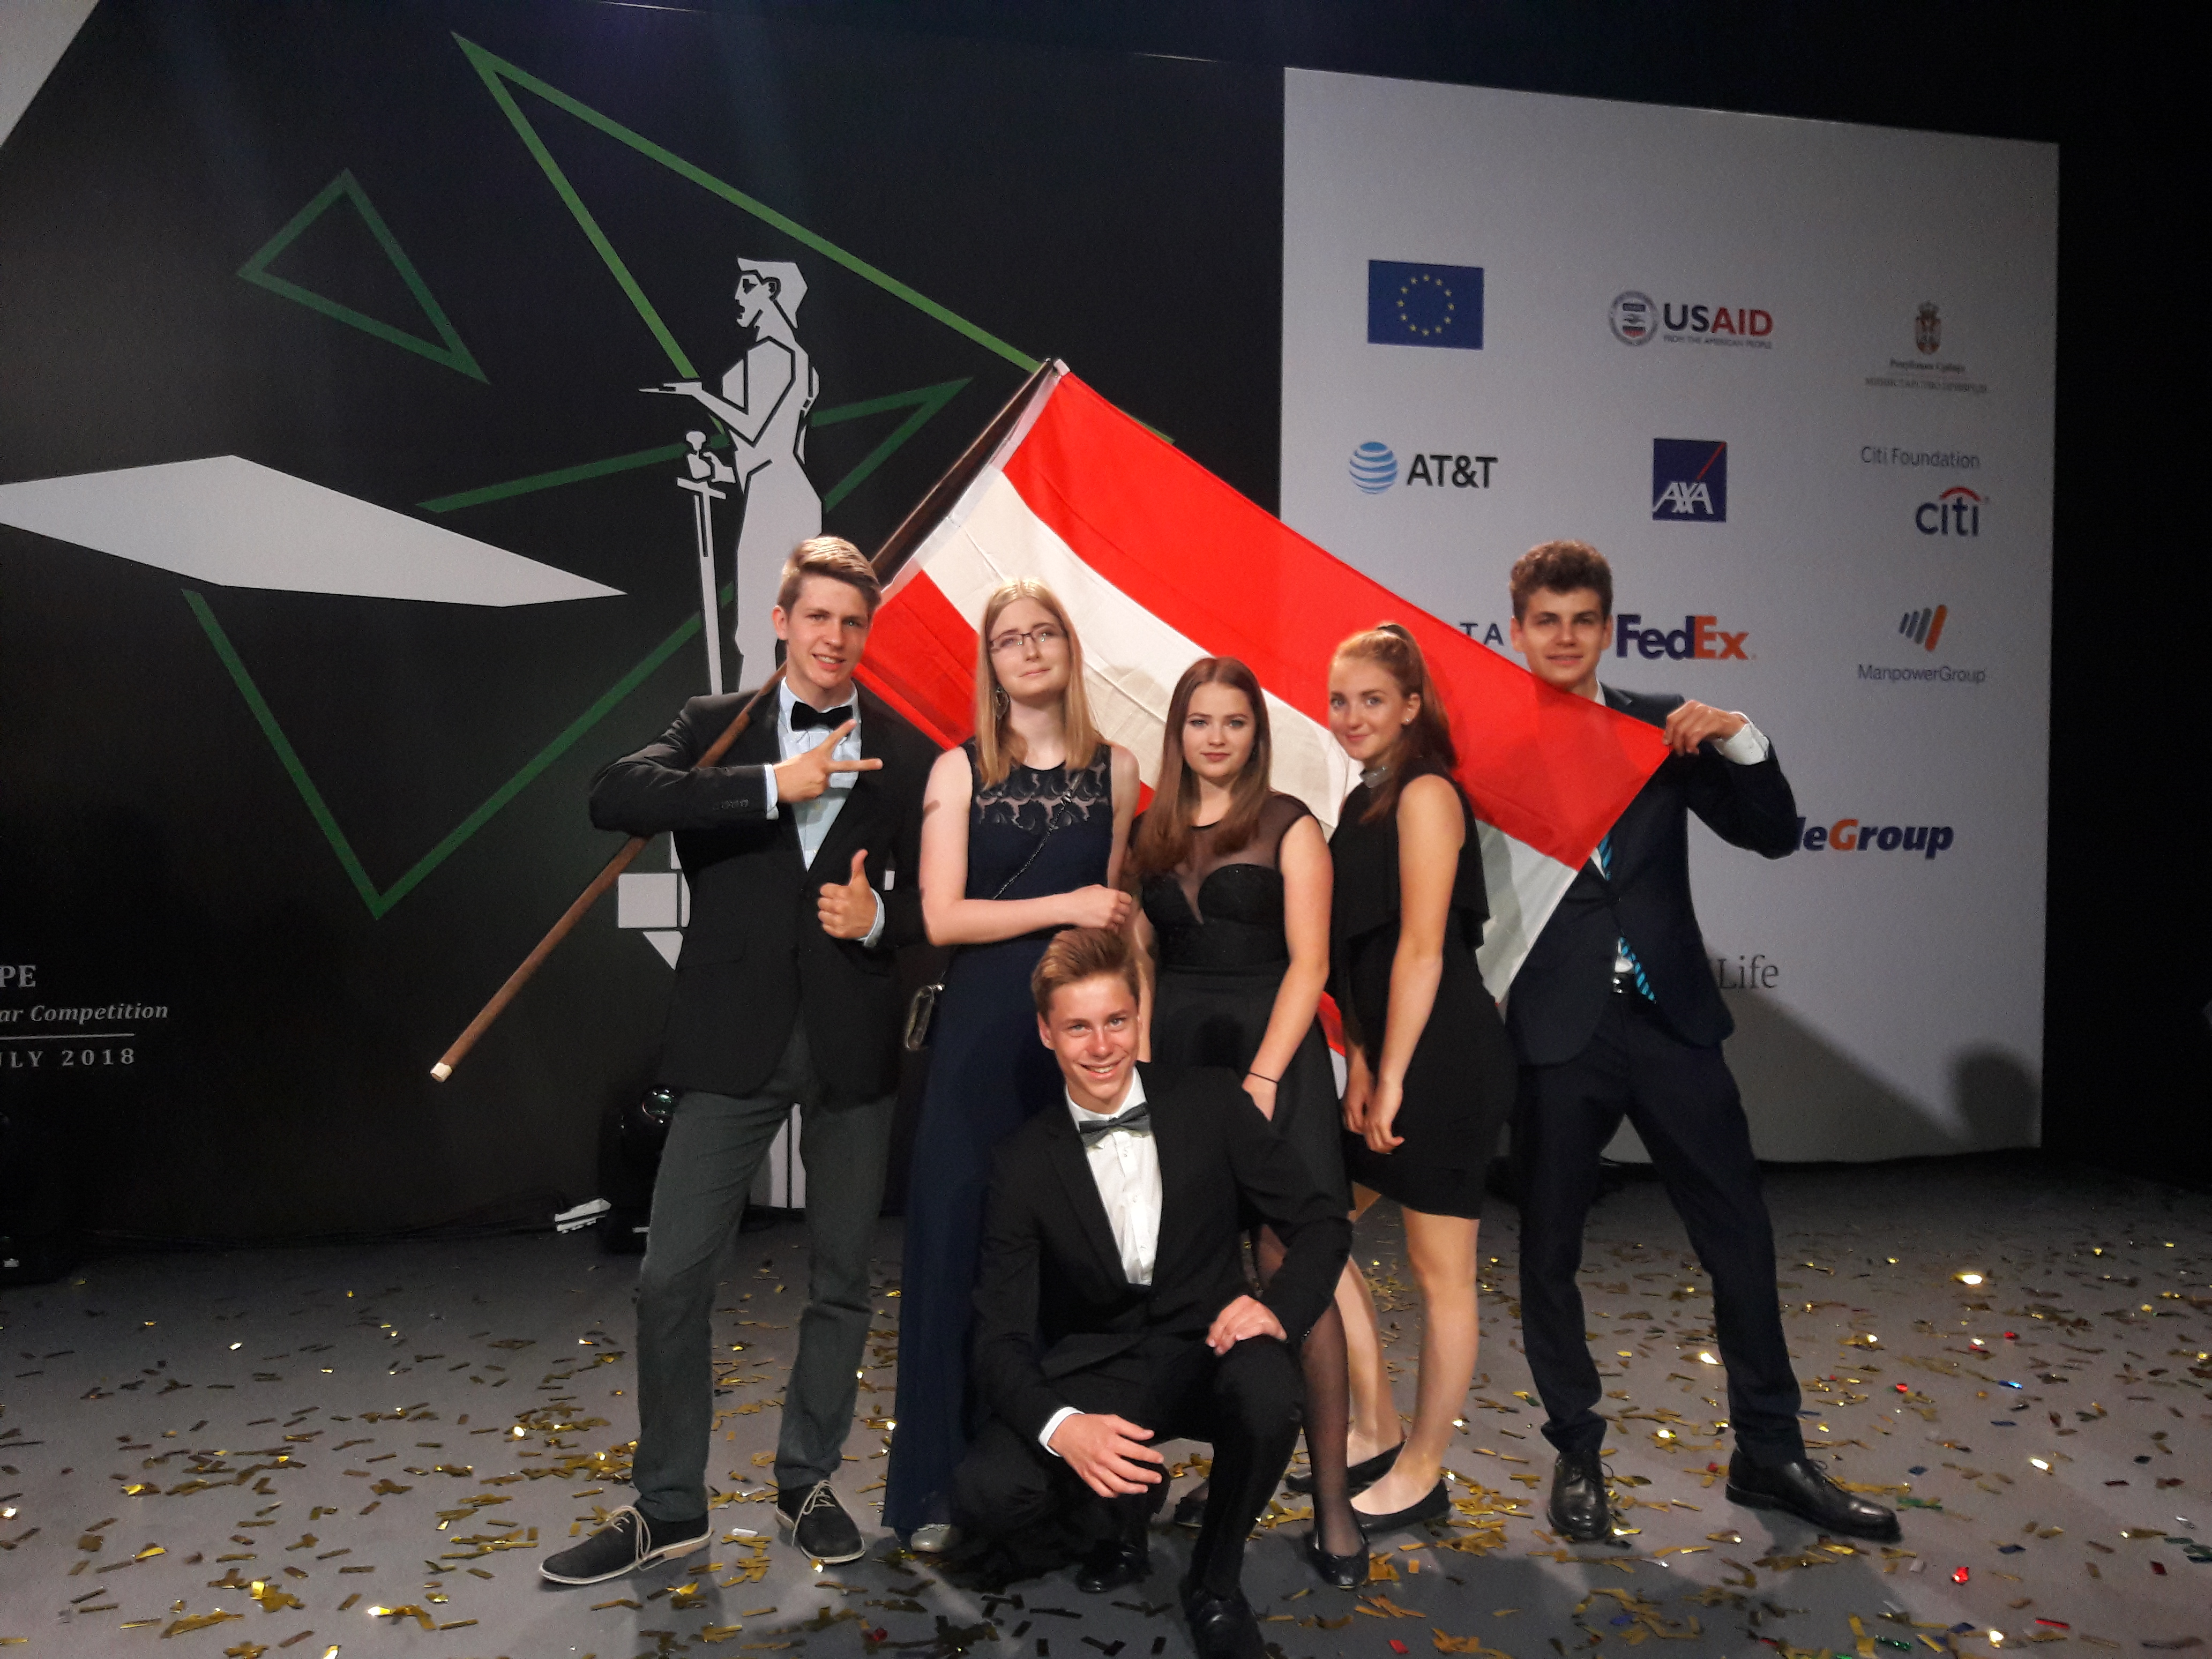 COYC 2018 Belgrade